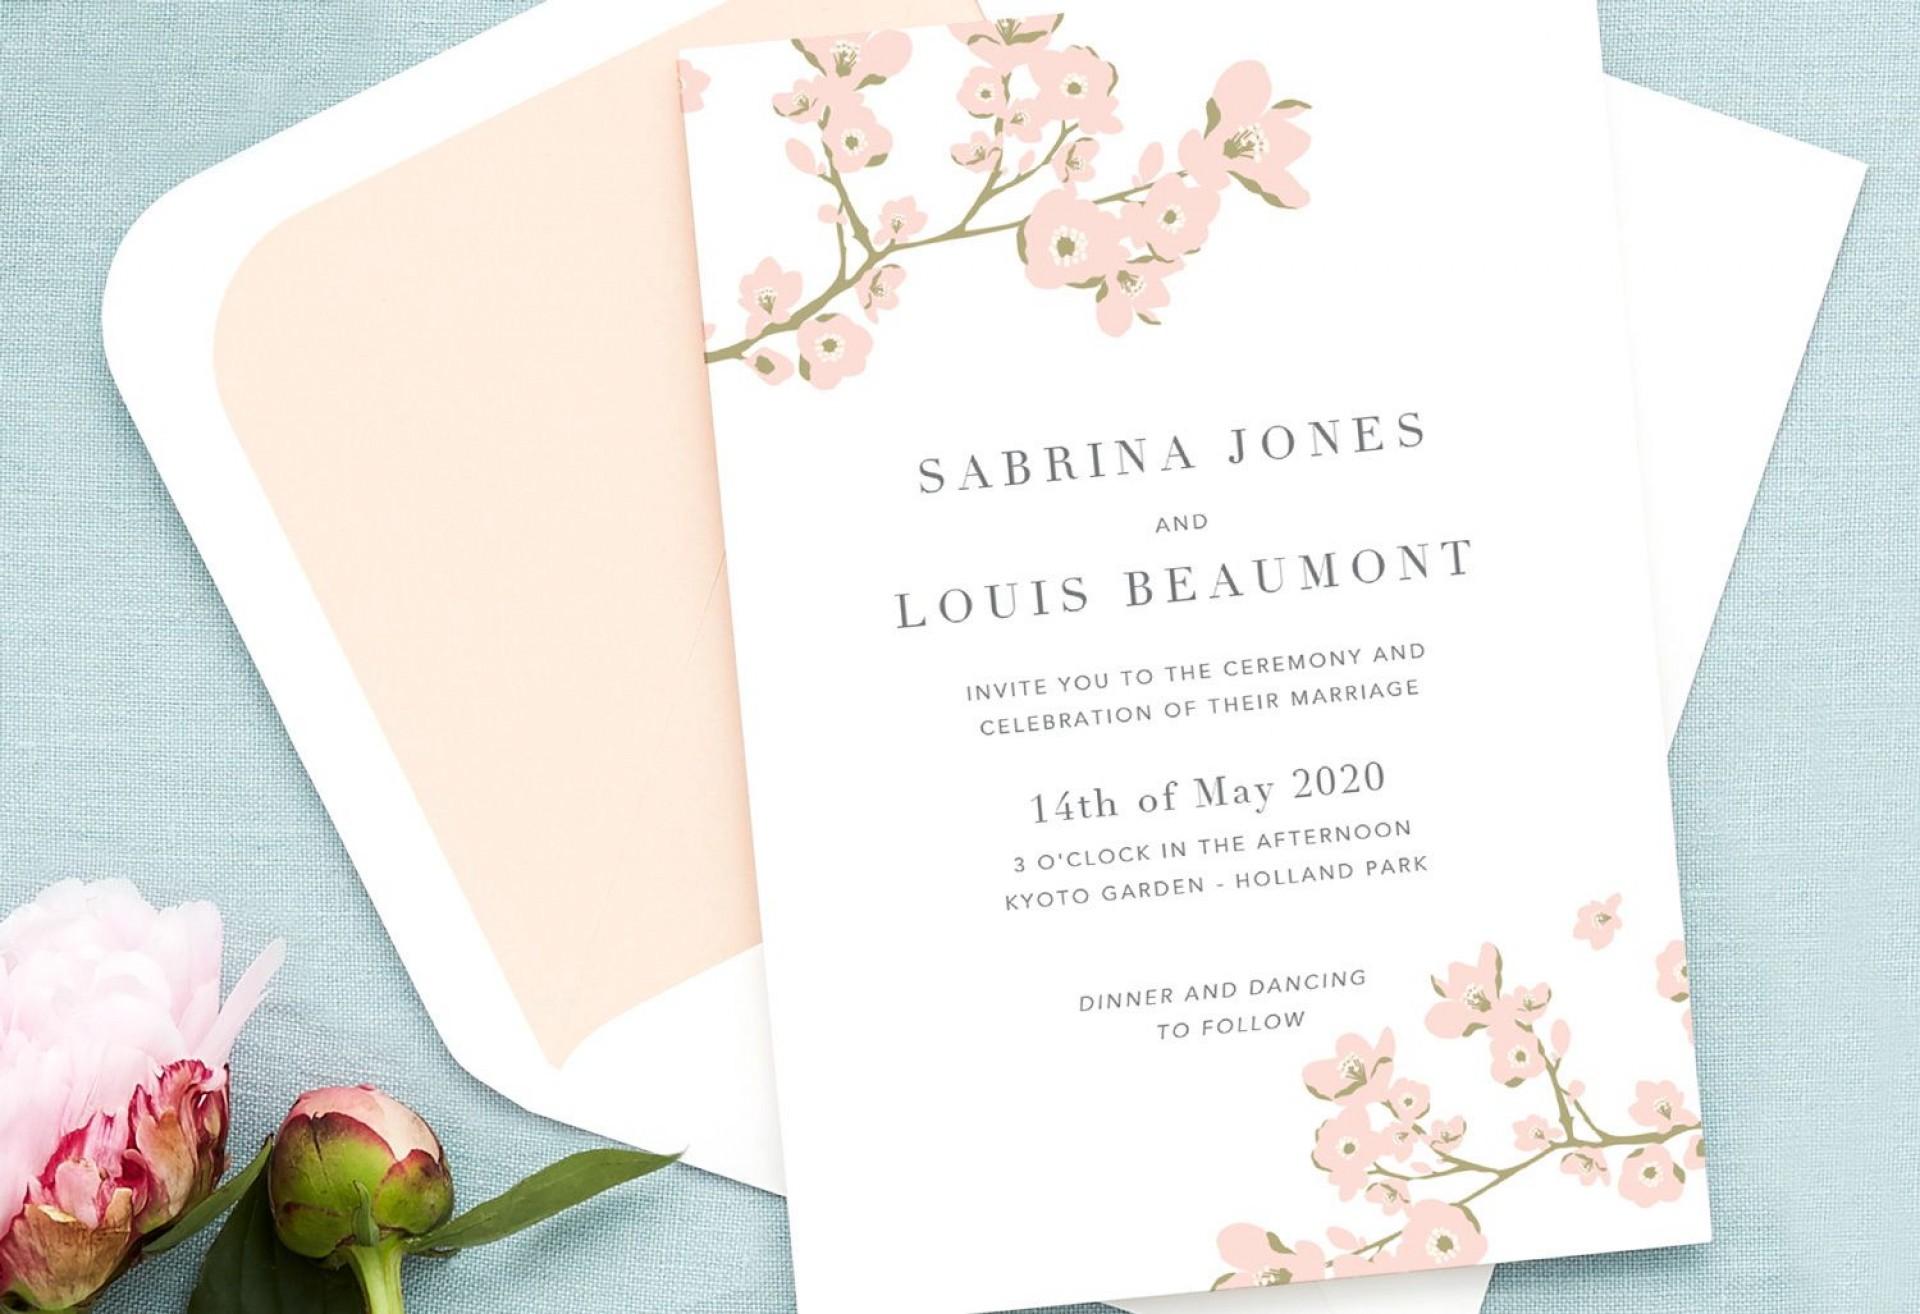 004 Shocking Wedding Invitation Template Word Photo  Invite Wording Uk Anniversary Microsoft Free Marriage1920